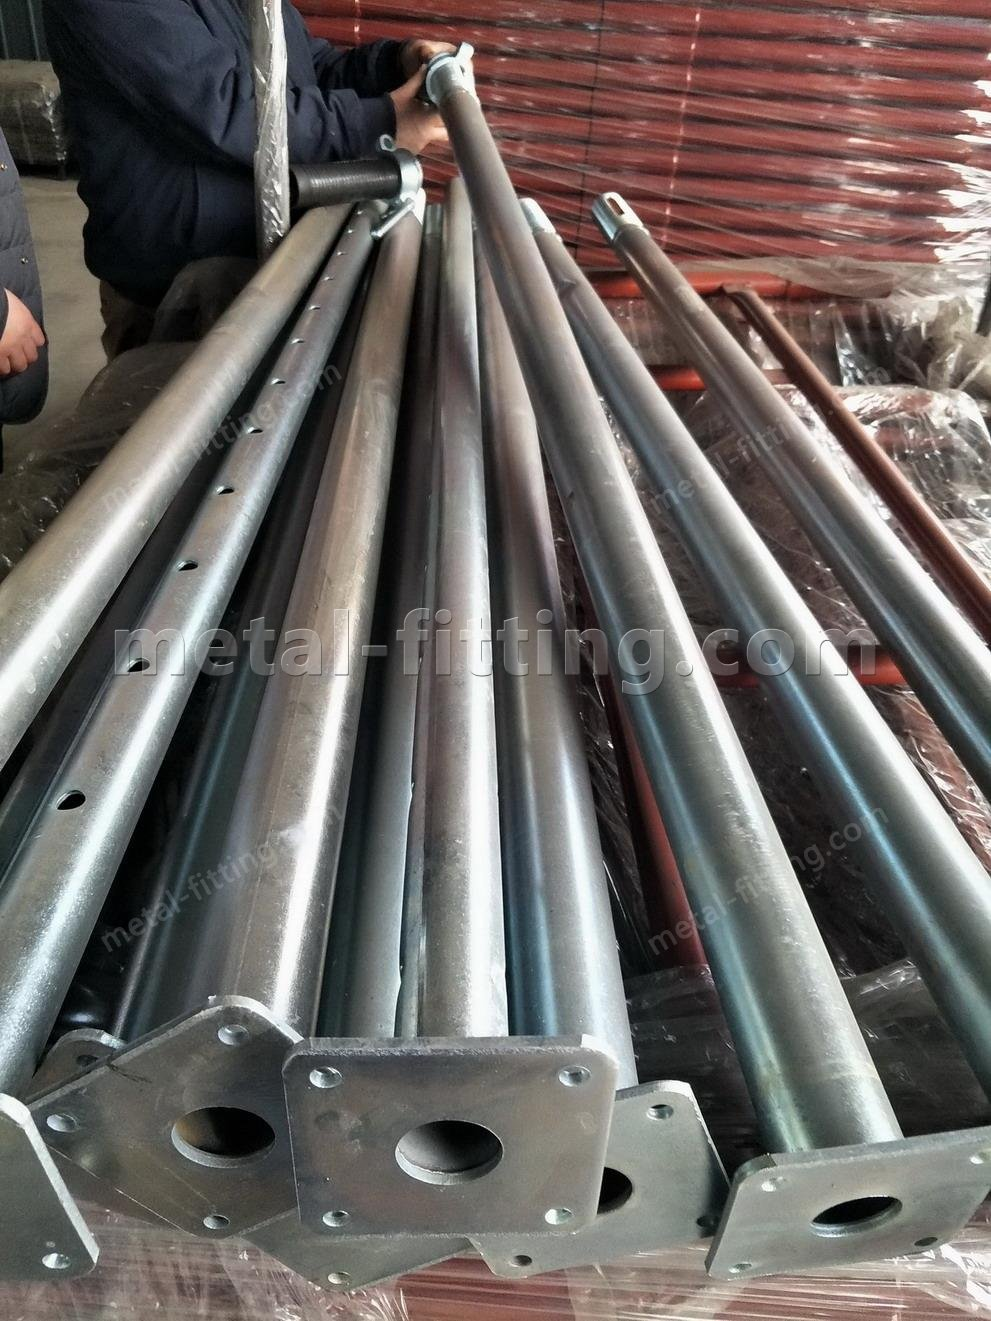 scaffolding standards jack base,scaffolding,scaffold part-scaffold JACK BASE (4)